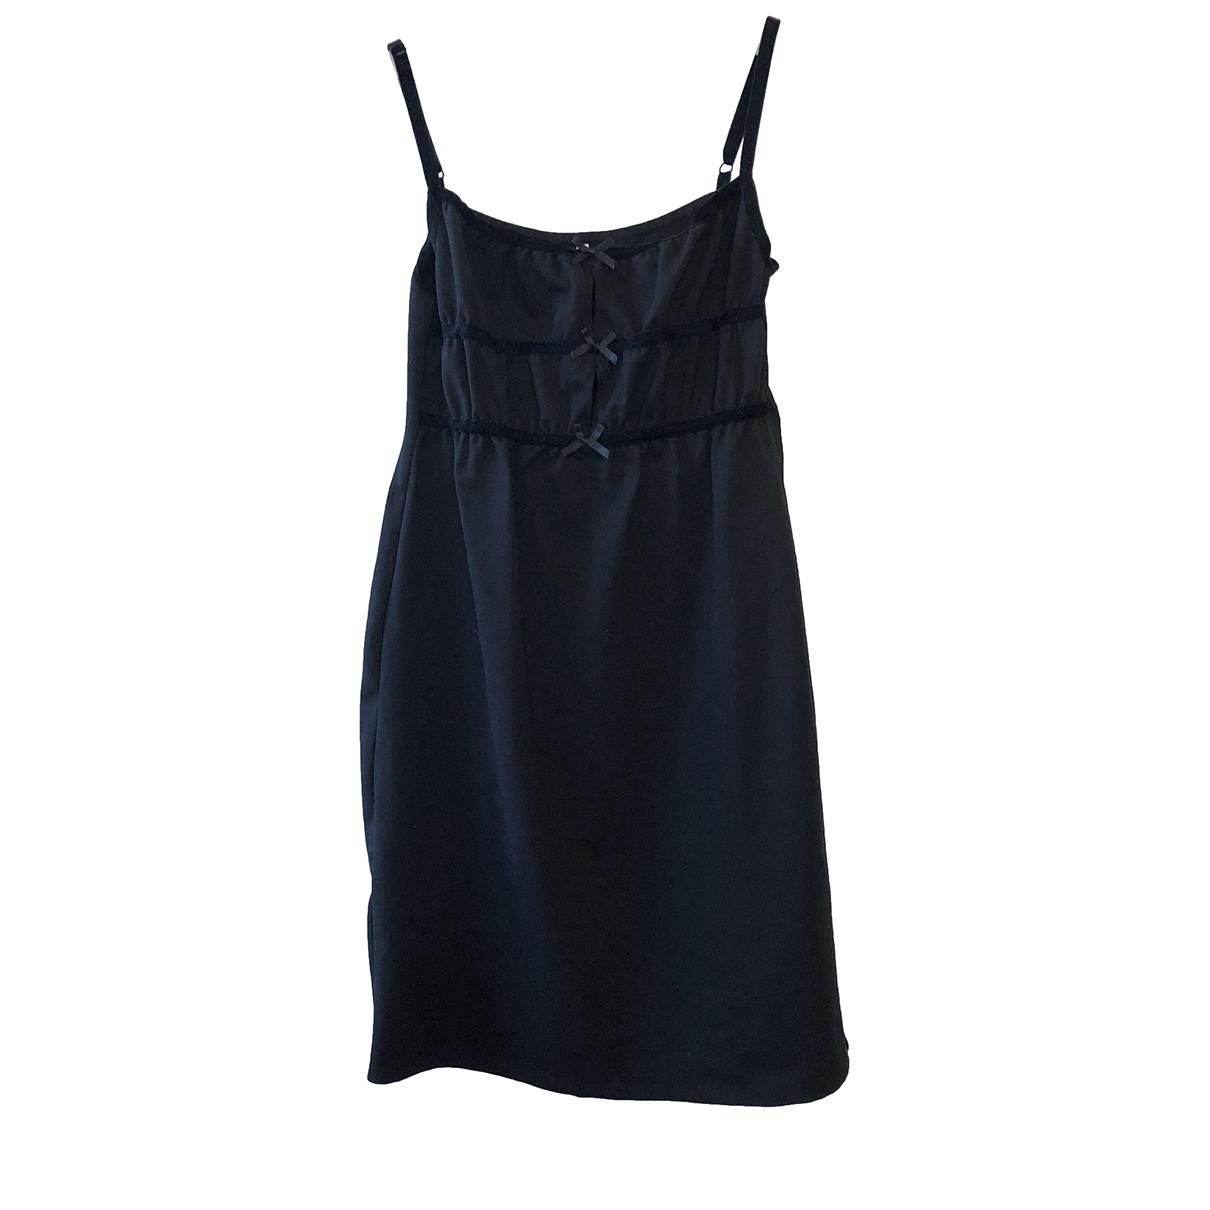 Solid & Striped \N Kleid in  Schwarz Viskose